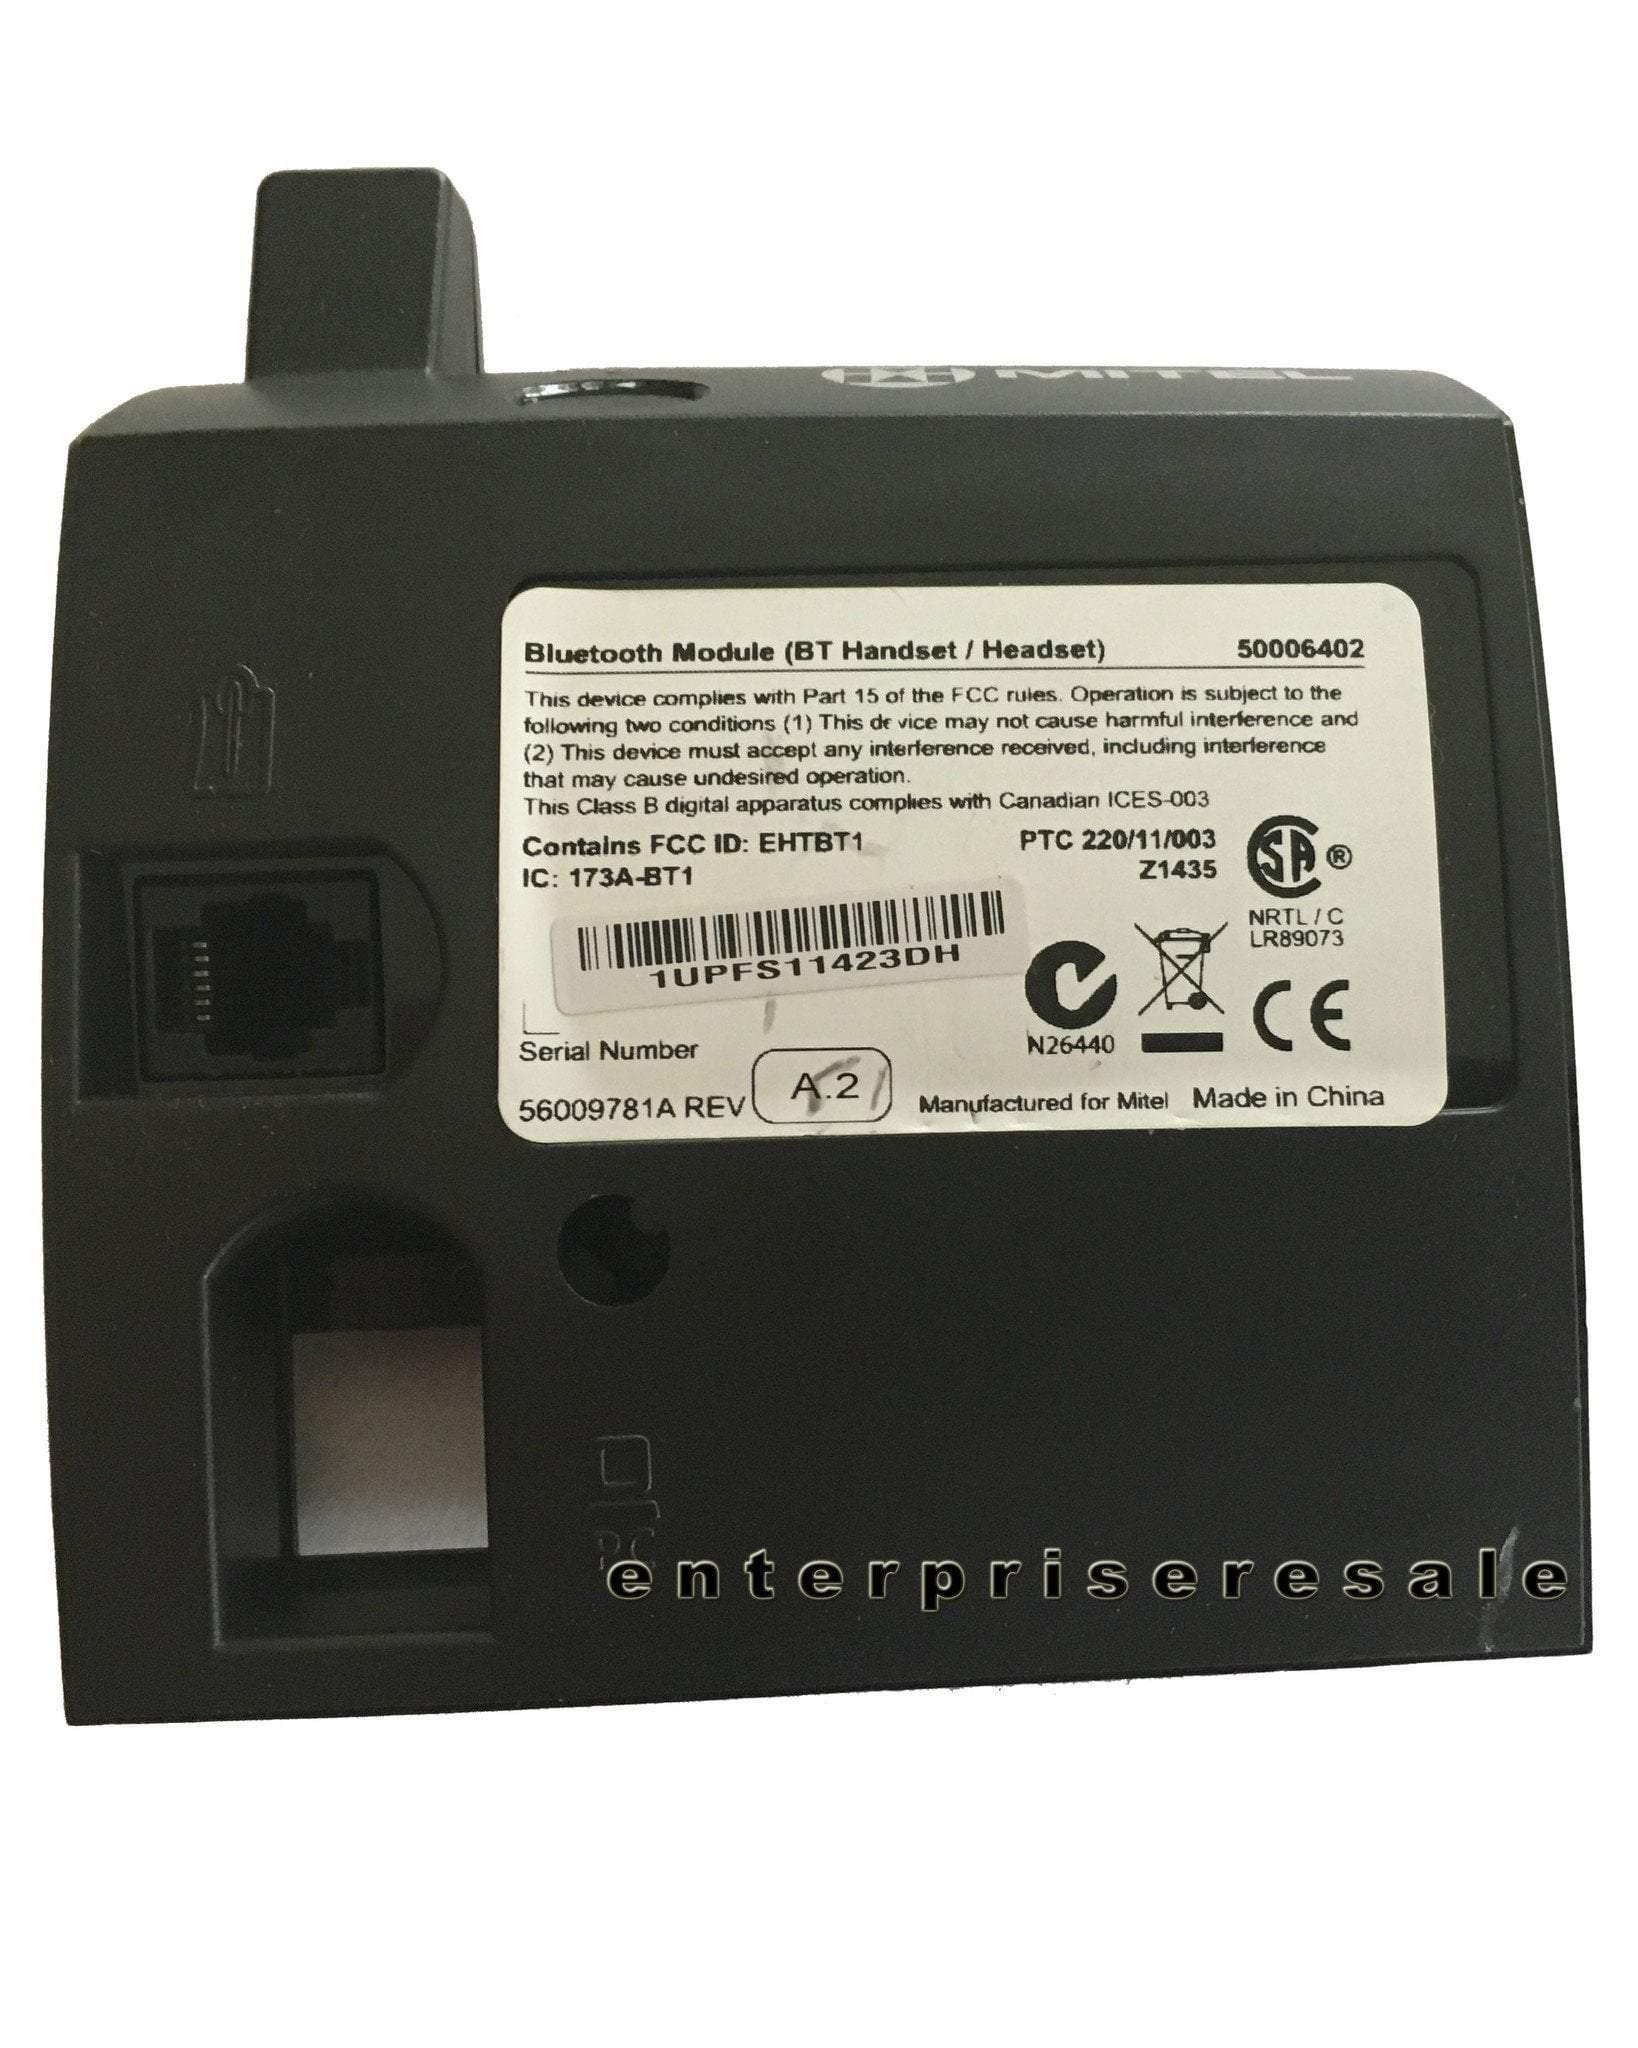 Mitel Axxes Phone System Wiring - allworx 9212l voip poe 12